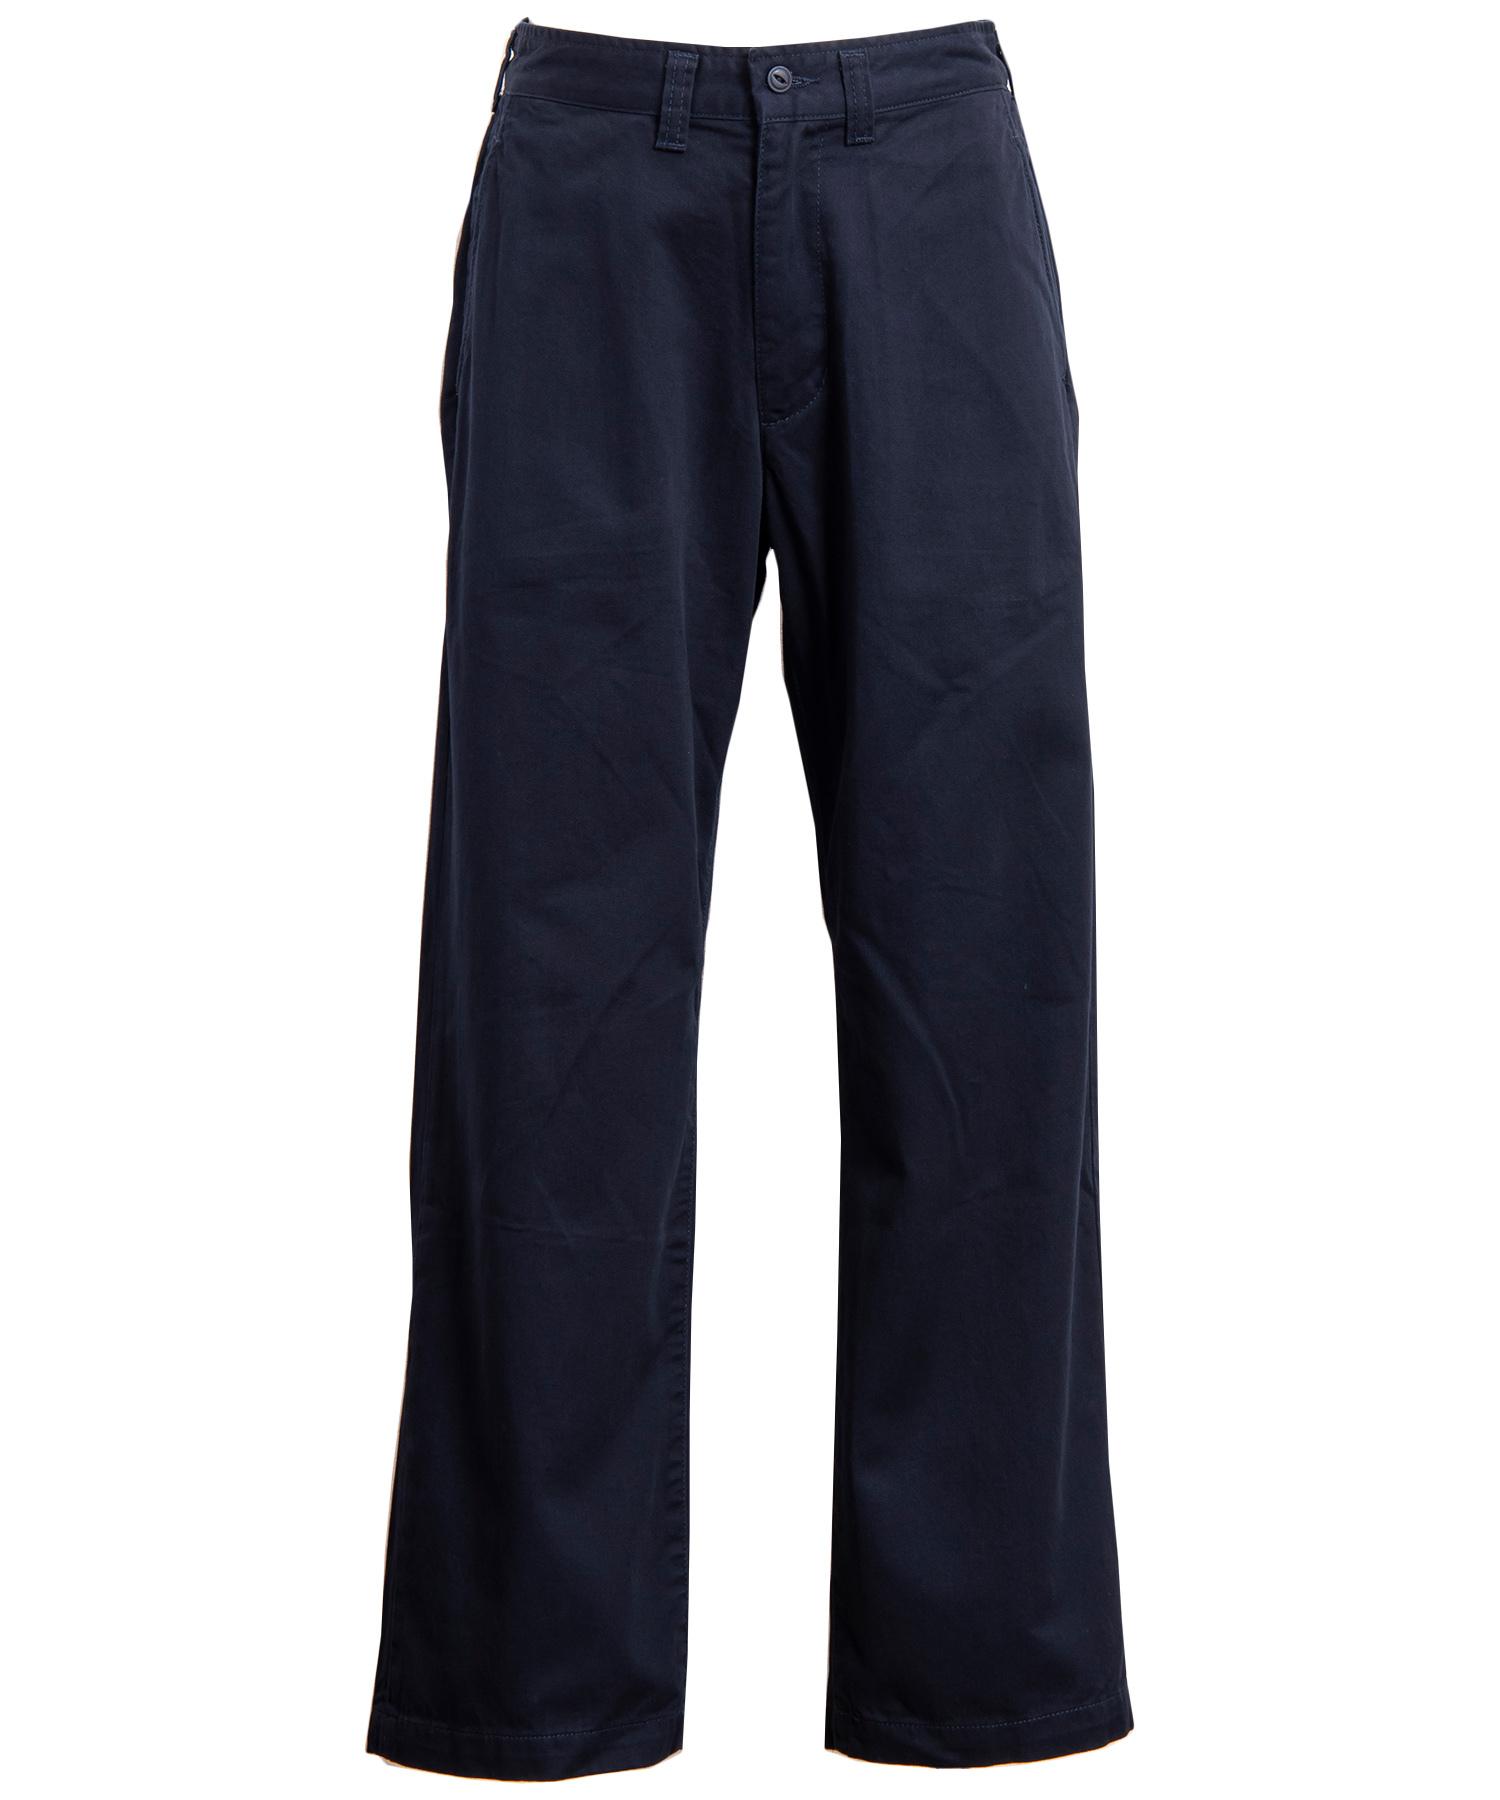 WIDE CHINO PANTS[REP032]